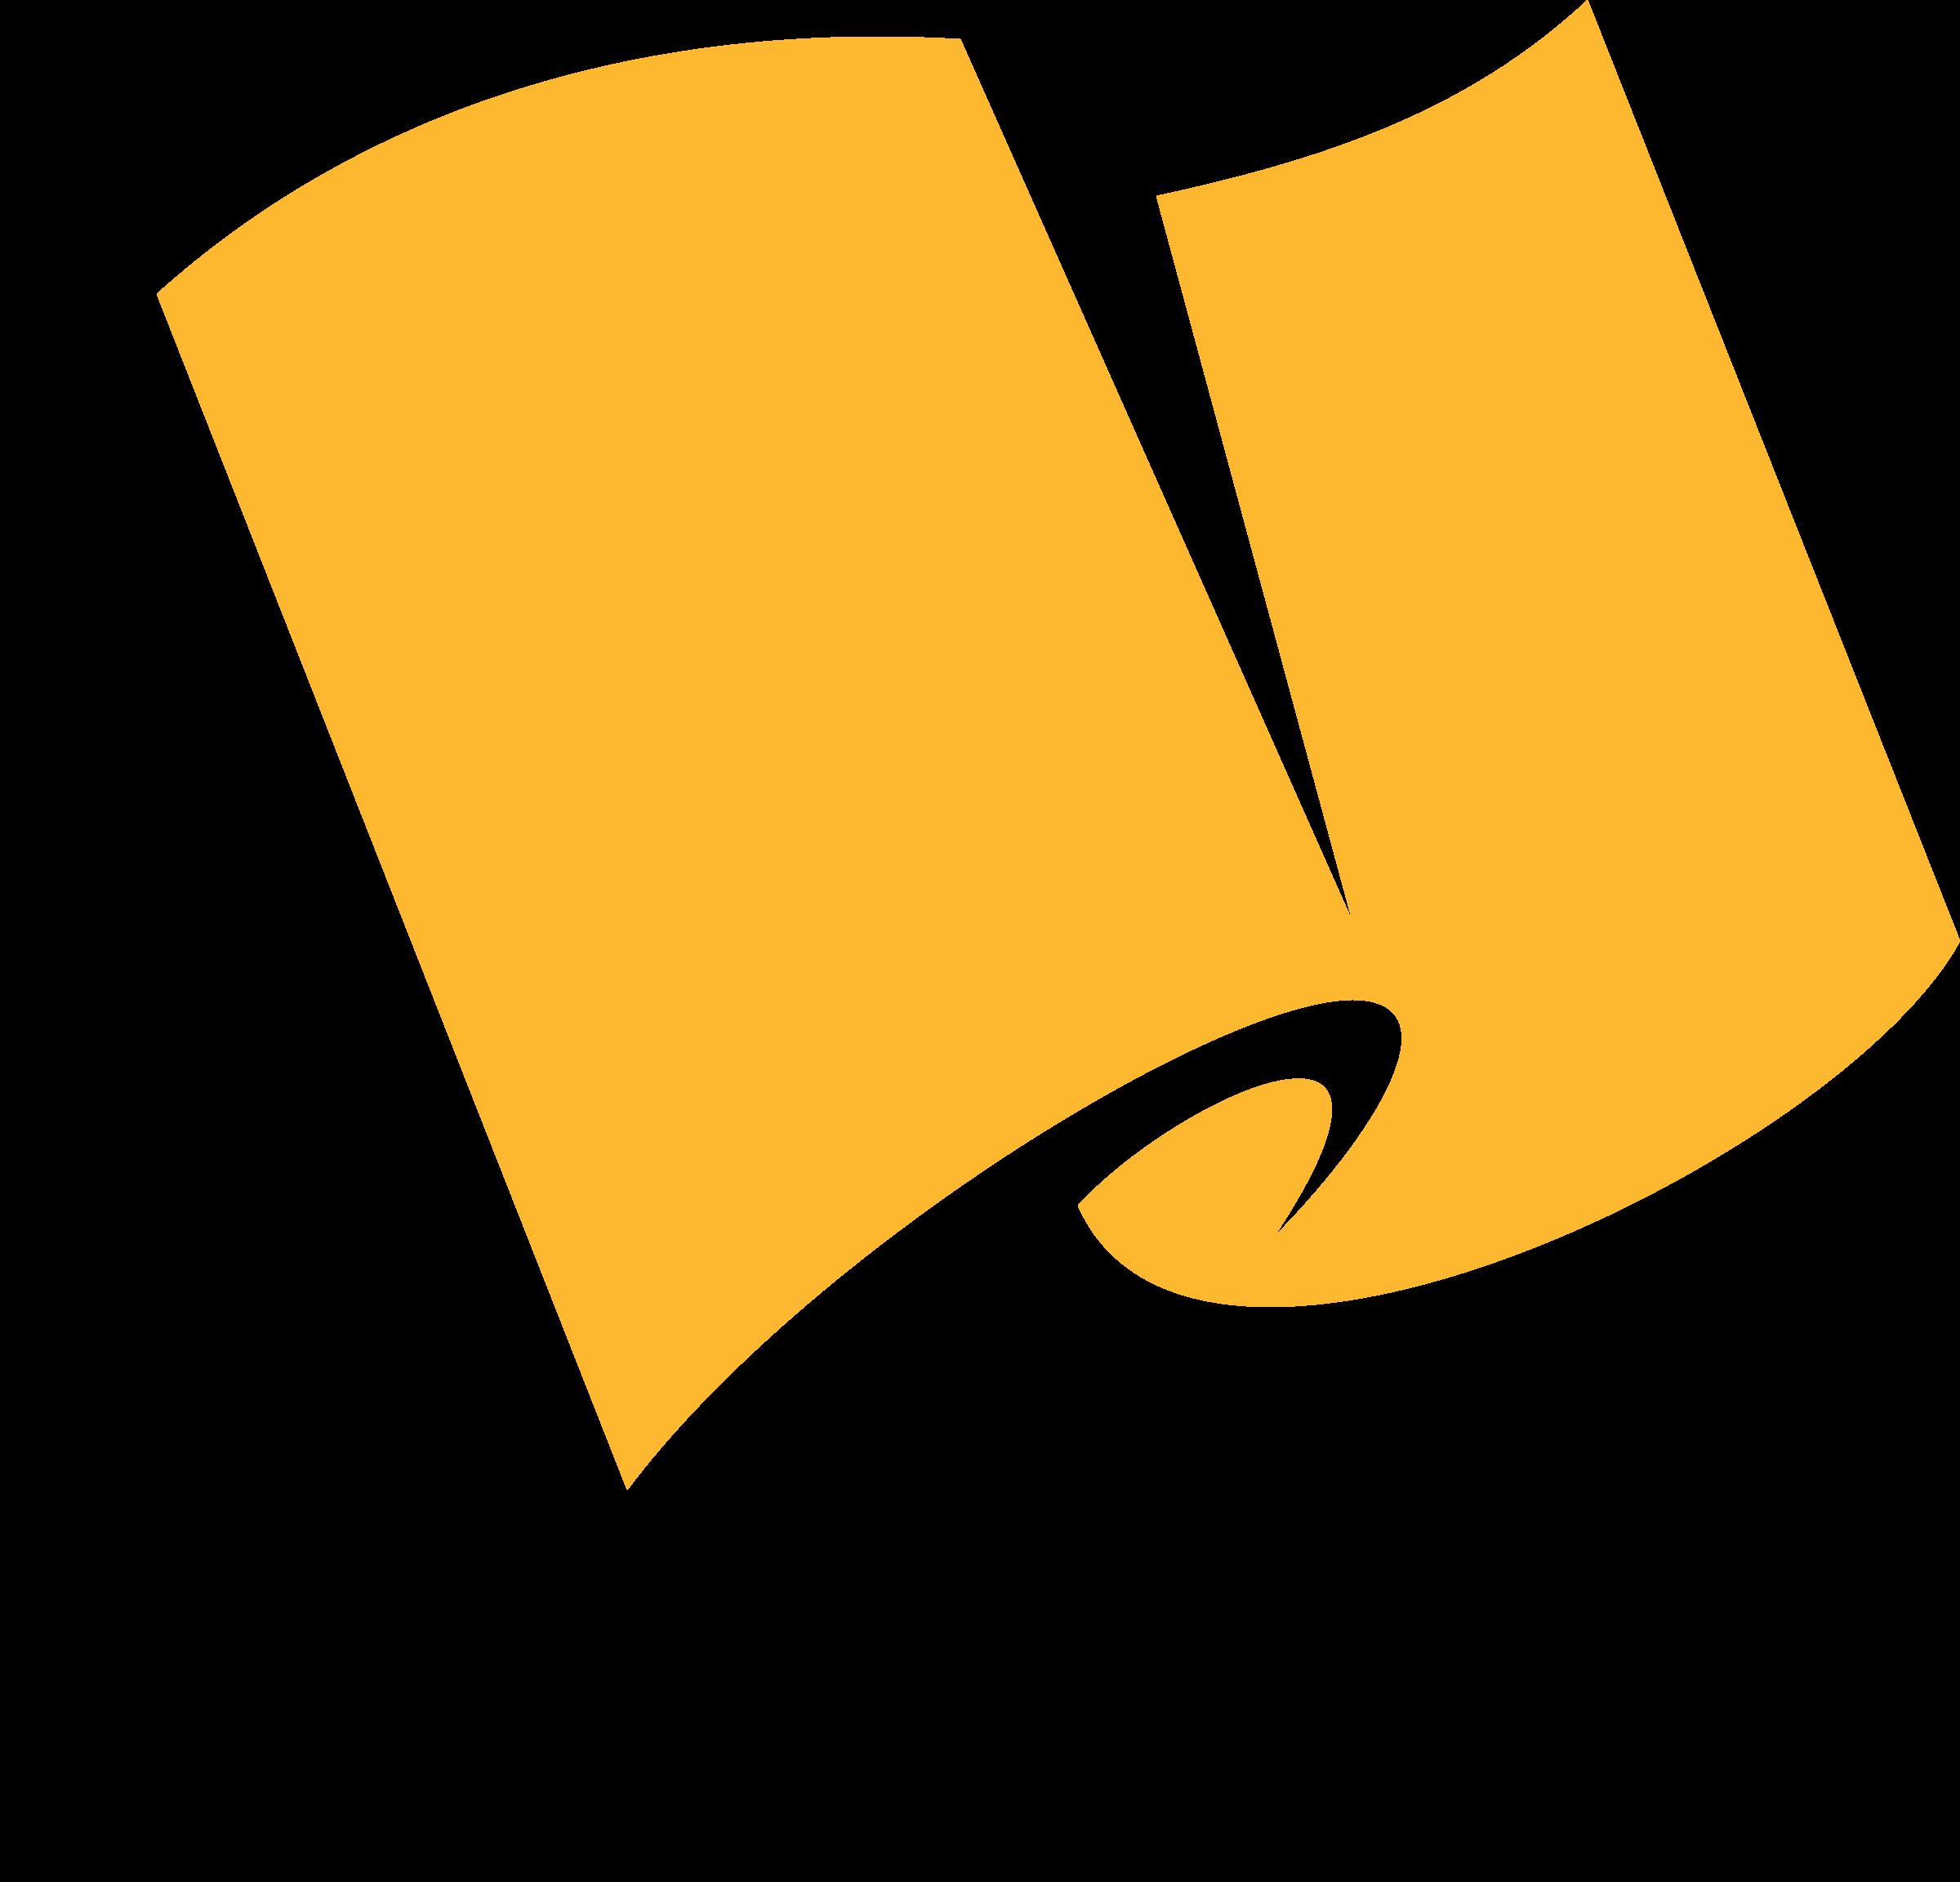 Race clipart racing banner. Flag yellow big image